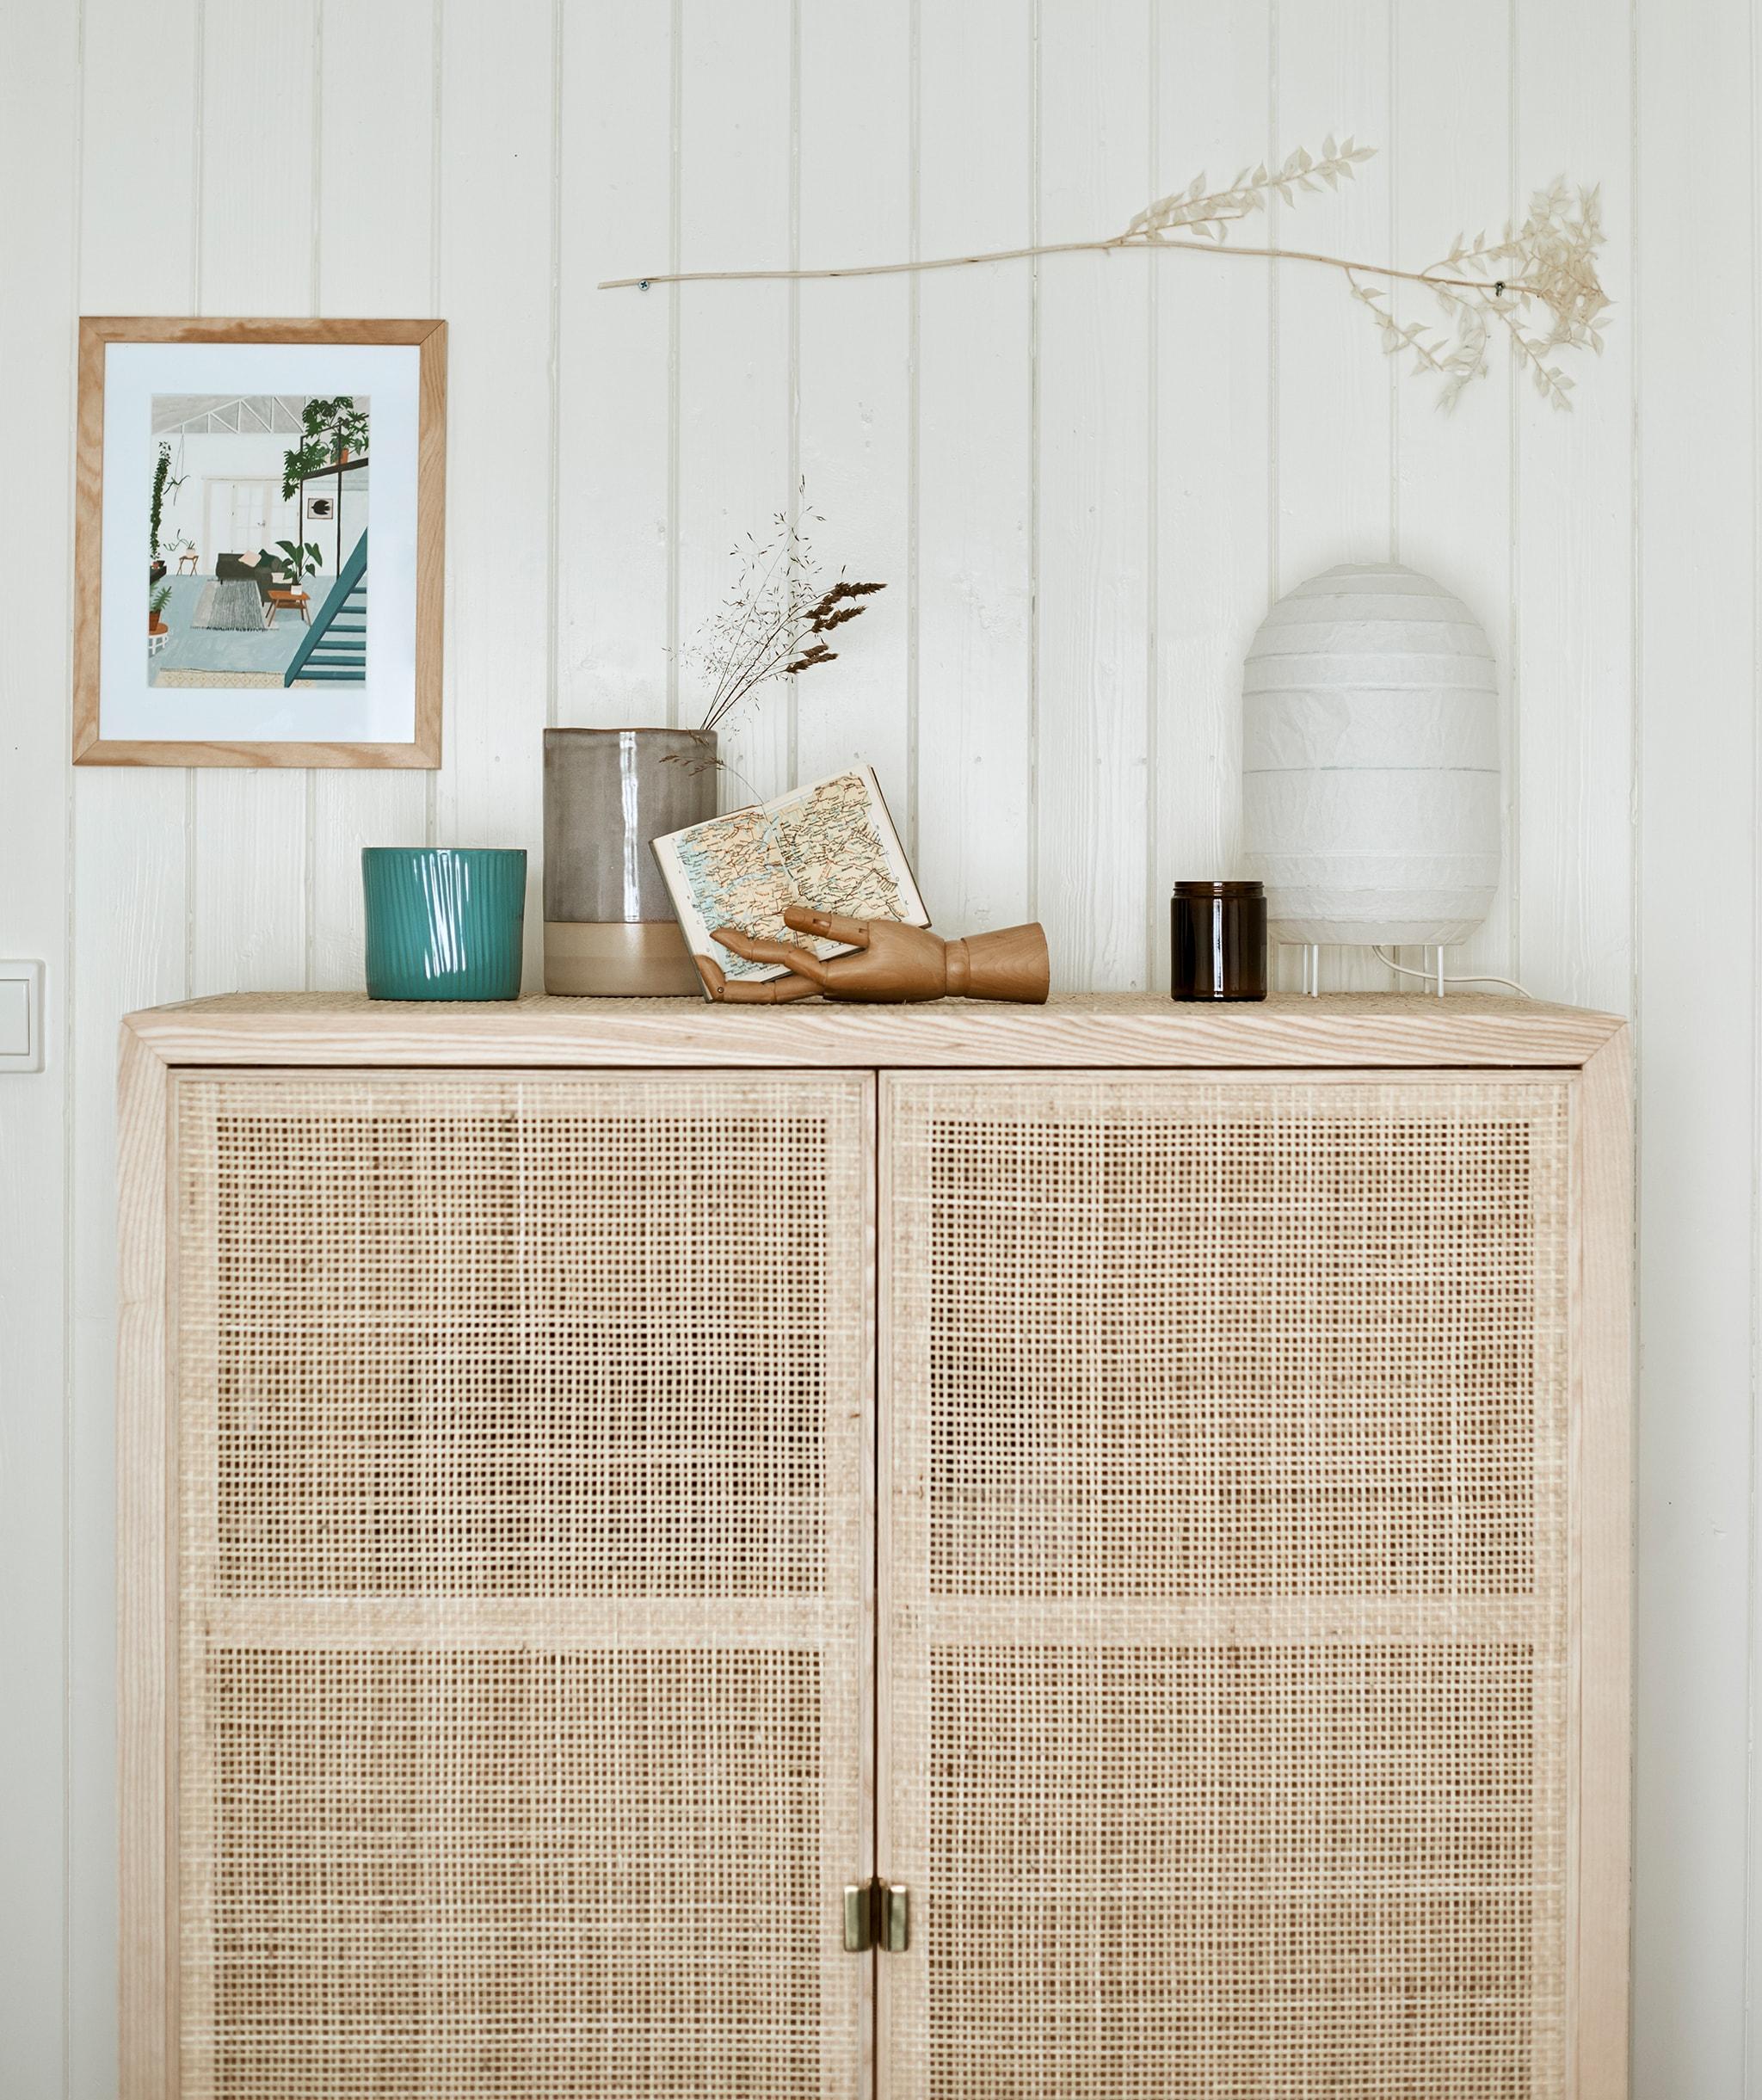 Lemari penyimpanan berbahan kayu yang tinggi dengan pintu anyaman dipasang pada dinding berpanel dengan lentera kertas dan benda-benda yang dipajang di atasnya.